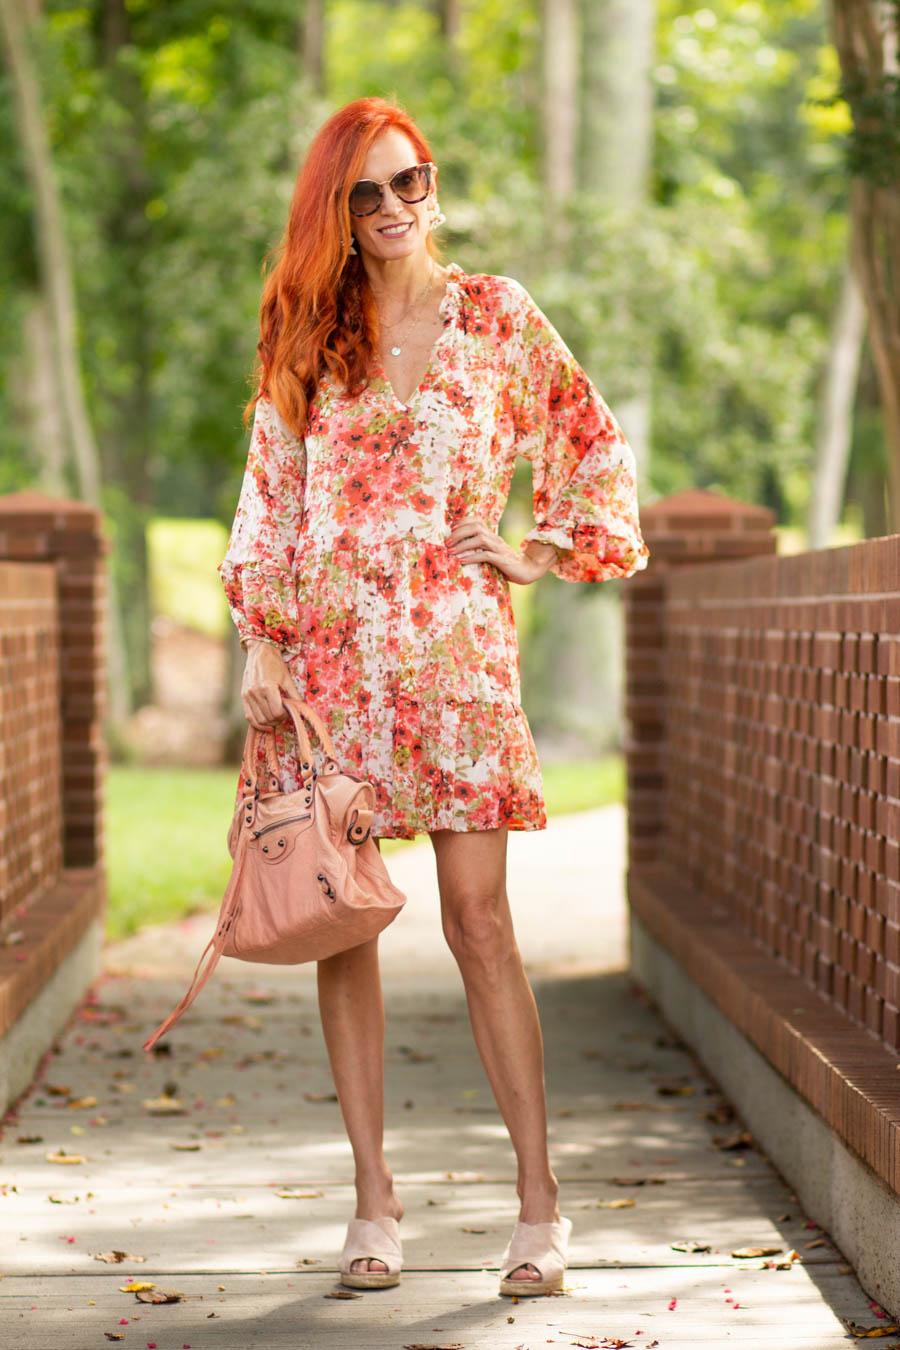 Floral women's dress